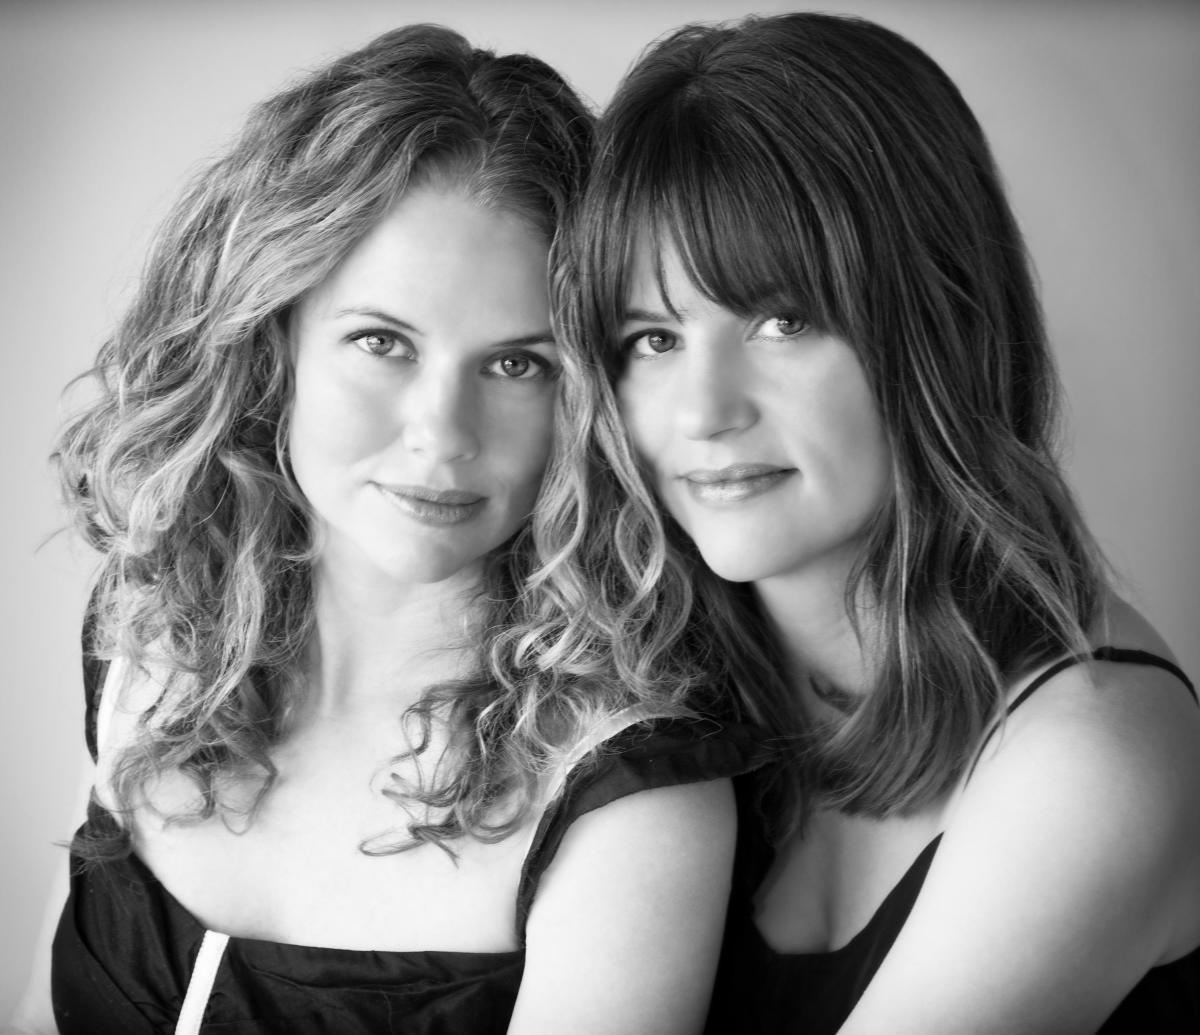 Photo: Wendi and Nicole Ferreira